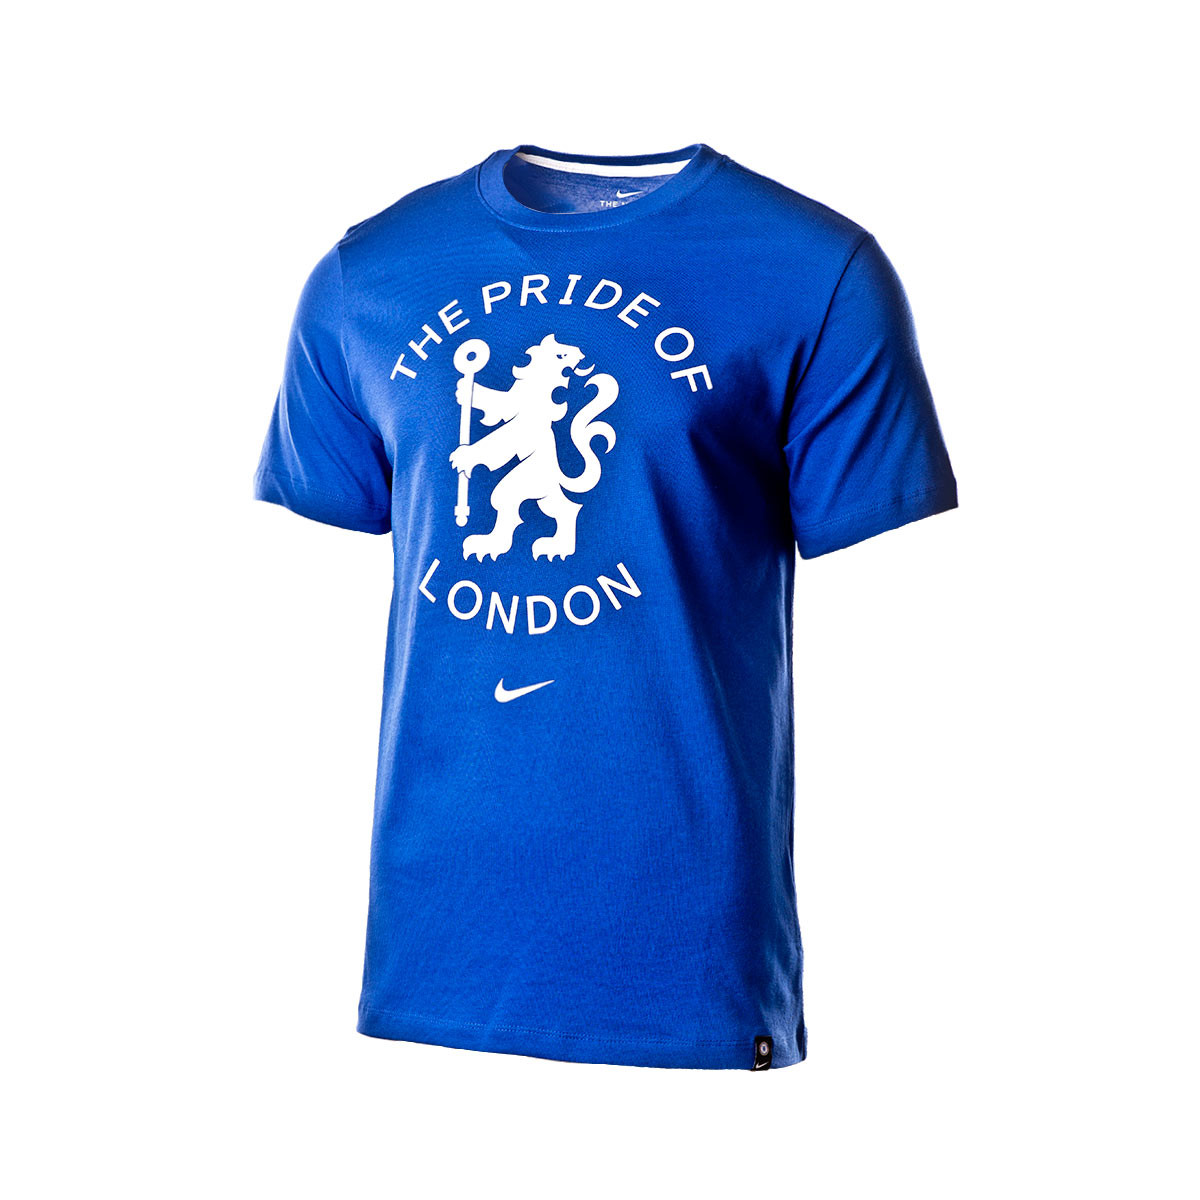 Jersey Nike Chelsea Fc Kit Story Tell 20189 2019 Rush Blue Football Store Futbol Emotion